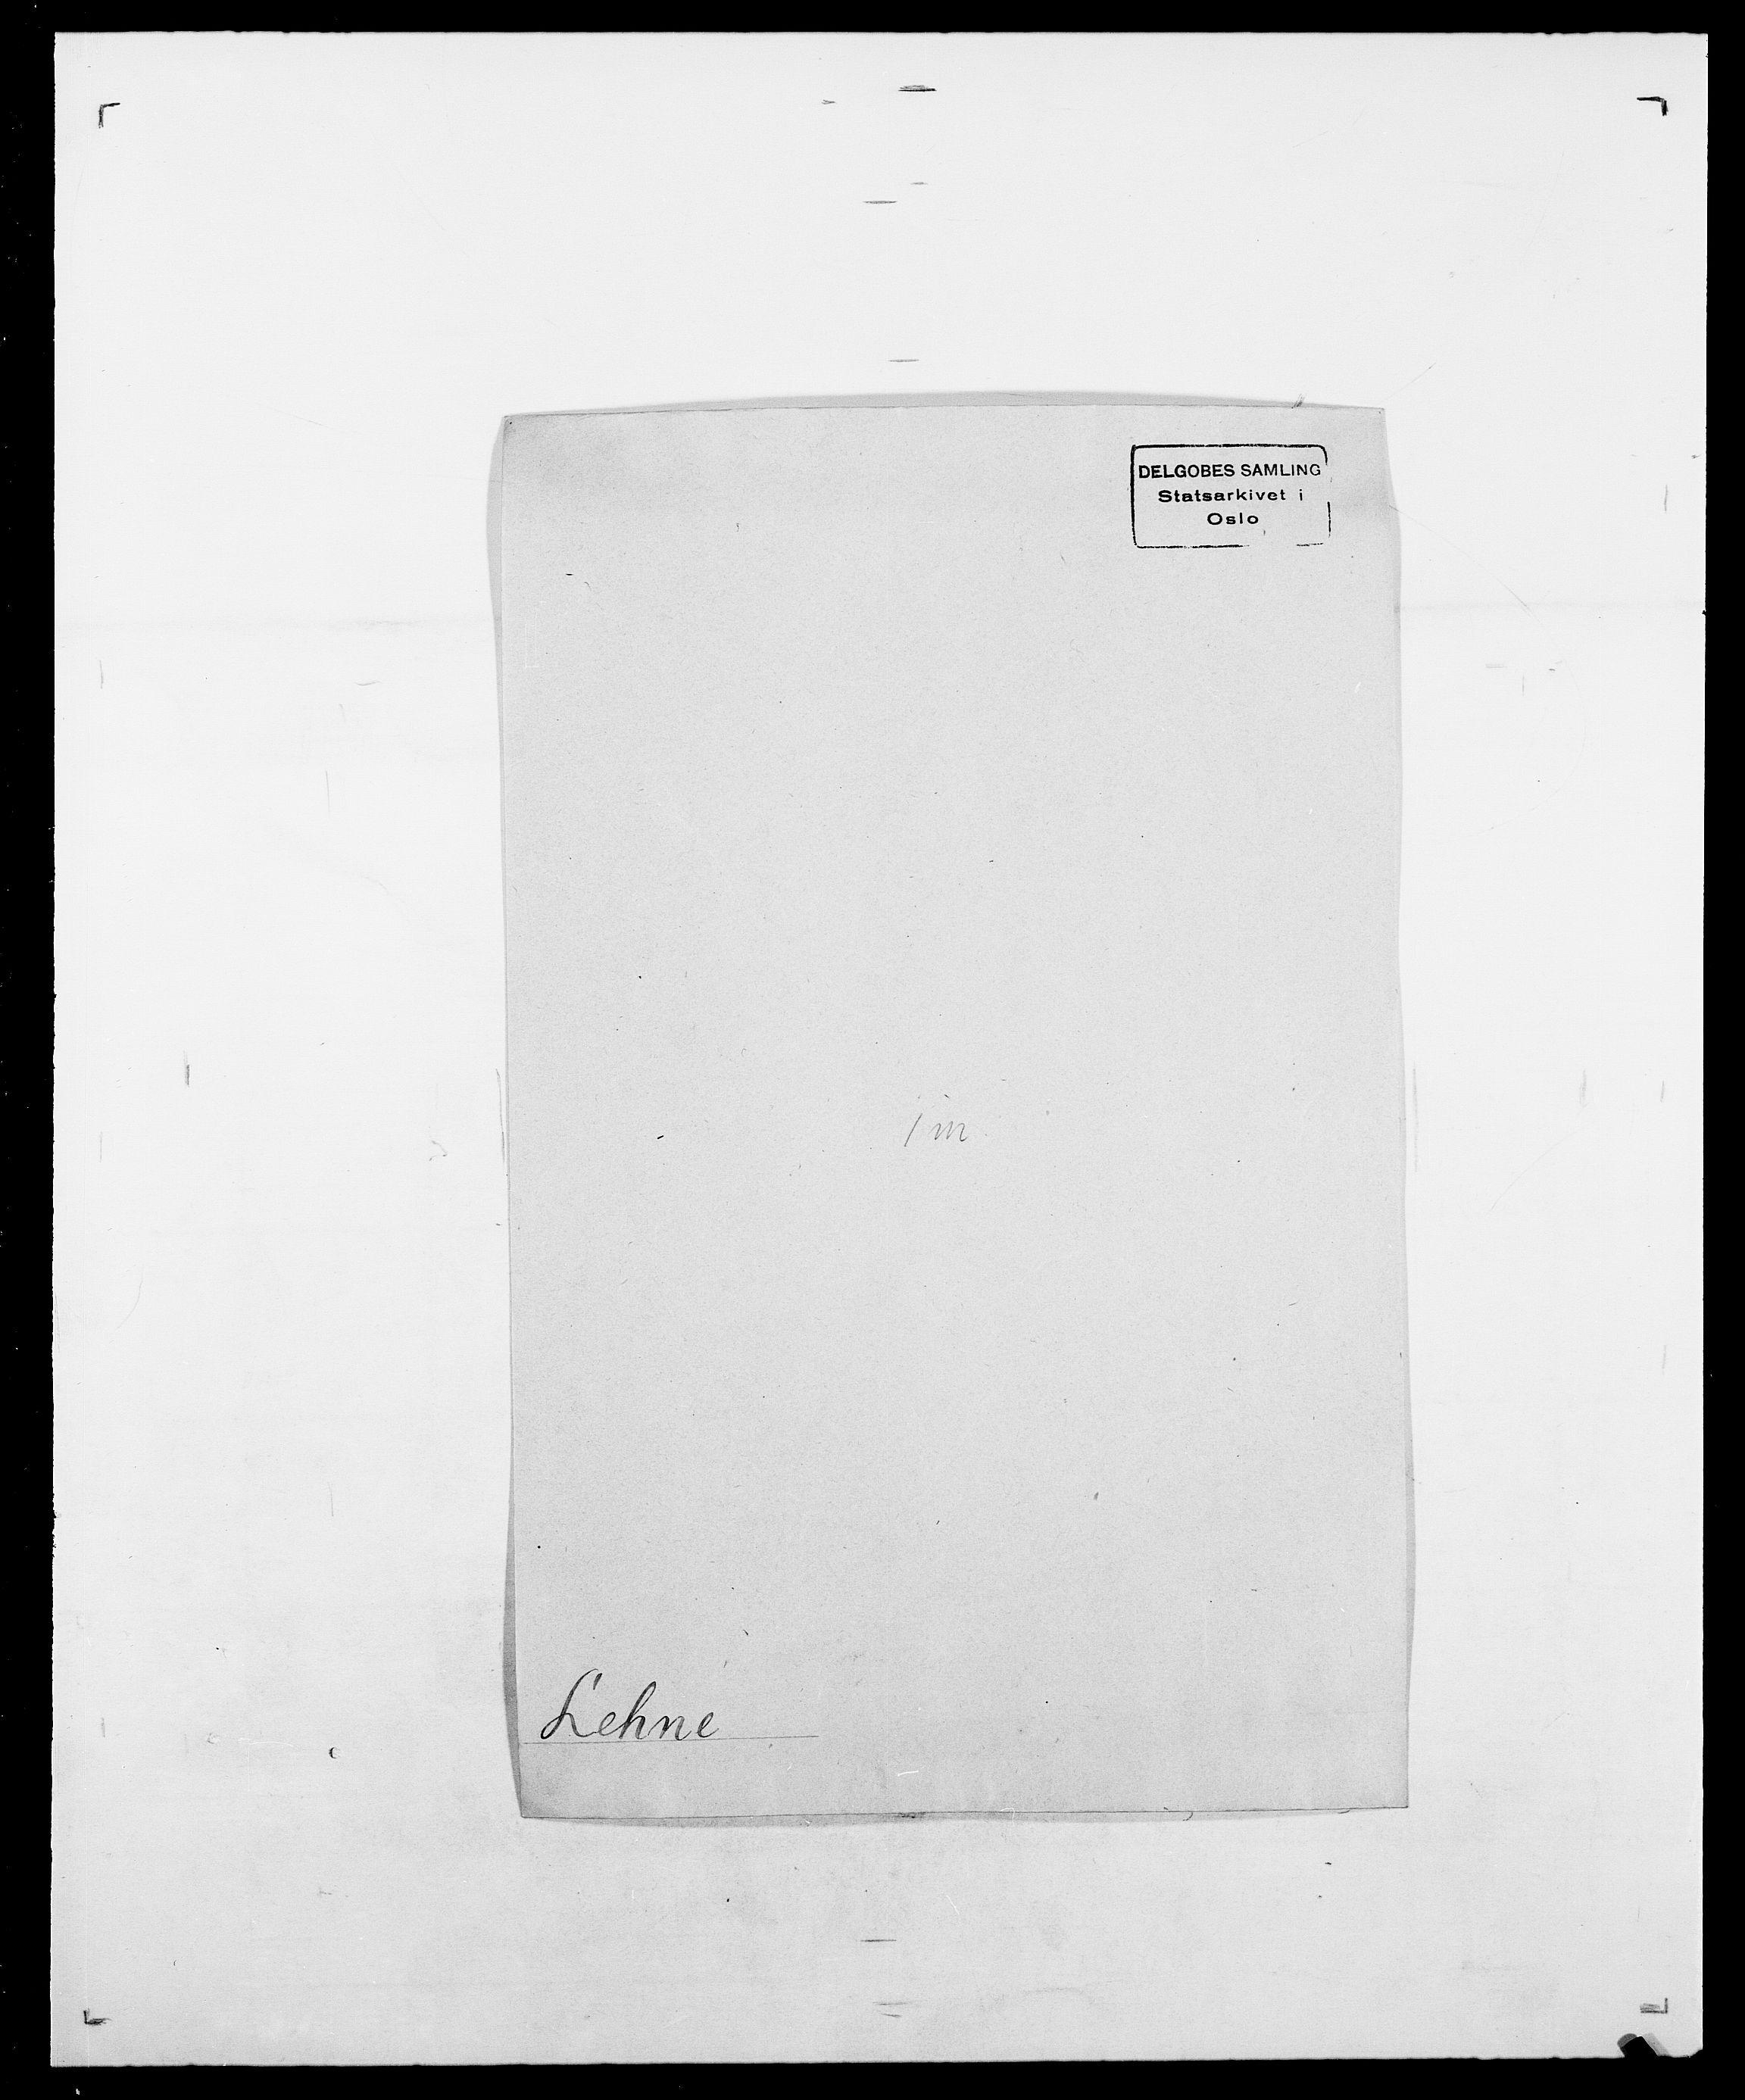 SAO, Delgobe, Charles Antoine - samling, D/Da/L0023: Lau - Lirvyn, s. 135